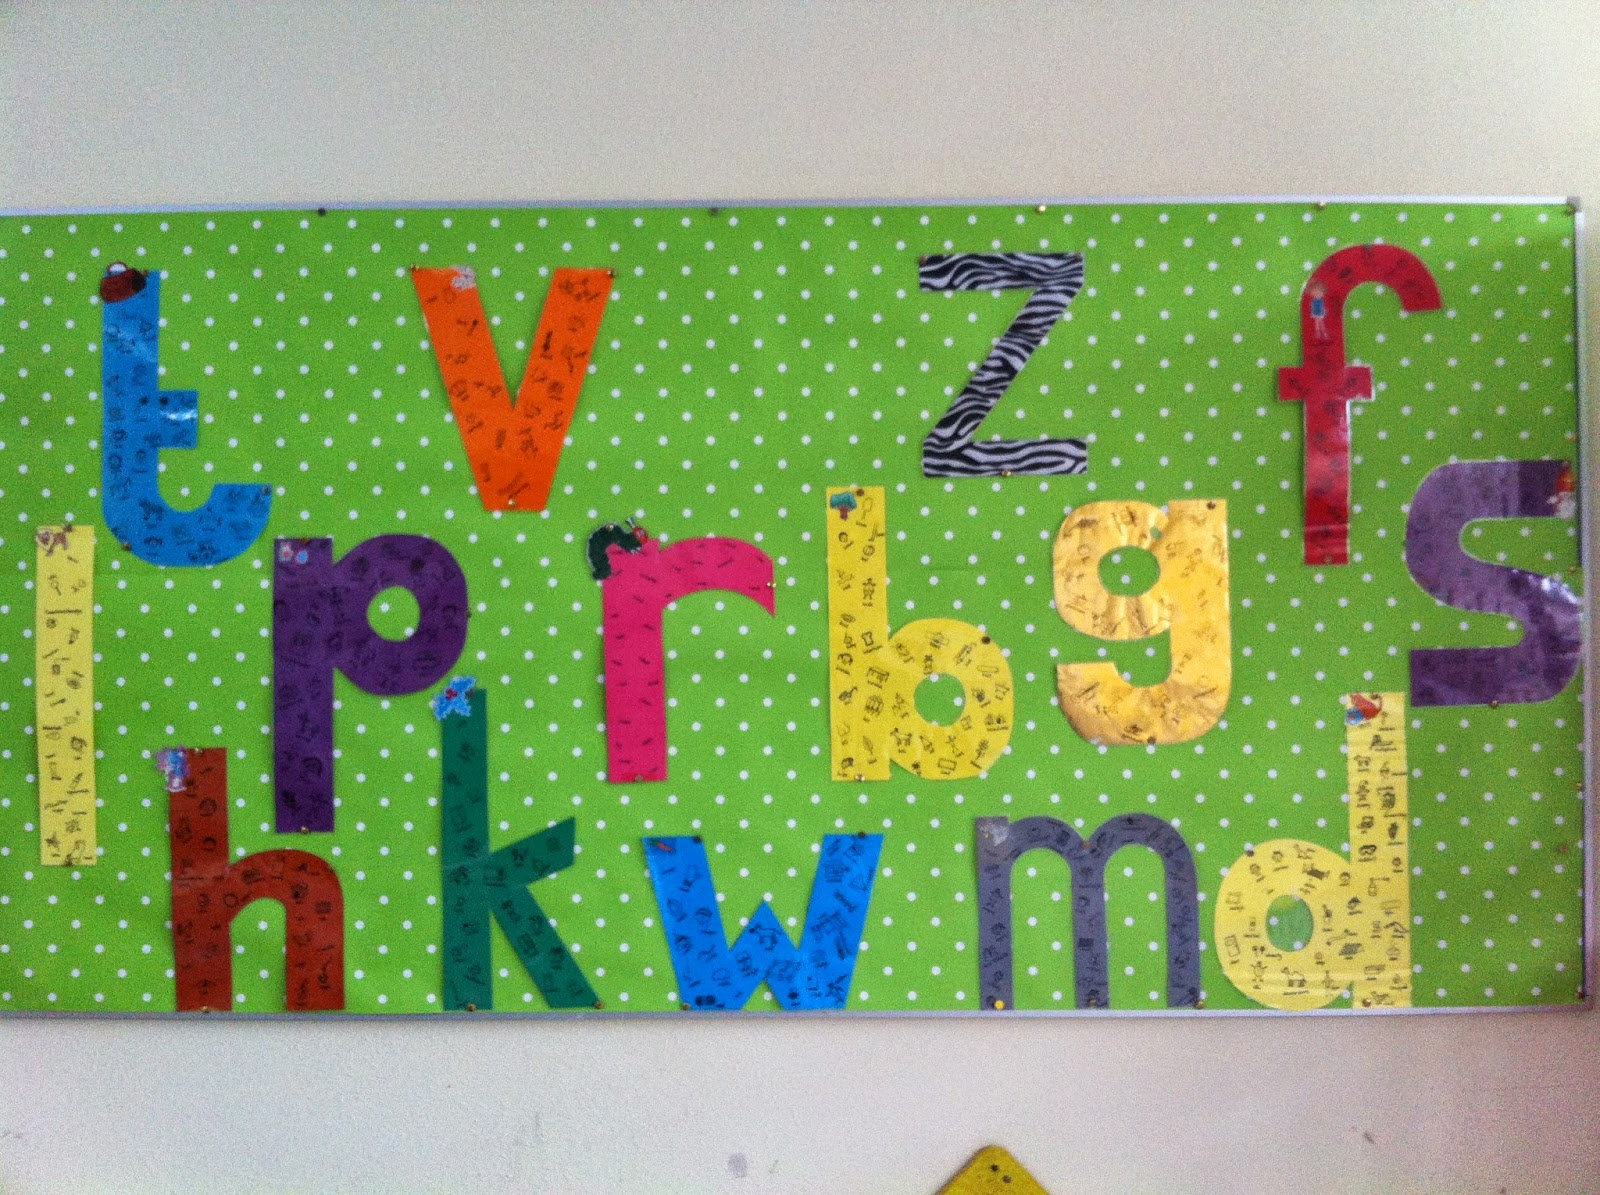 Favoriete Kleuterjuf in een kleuterklas: Beginnende geletterdheid &WB24